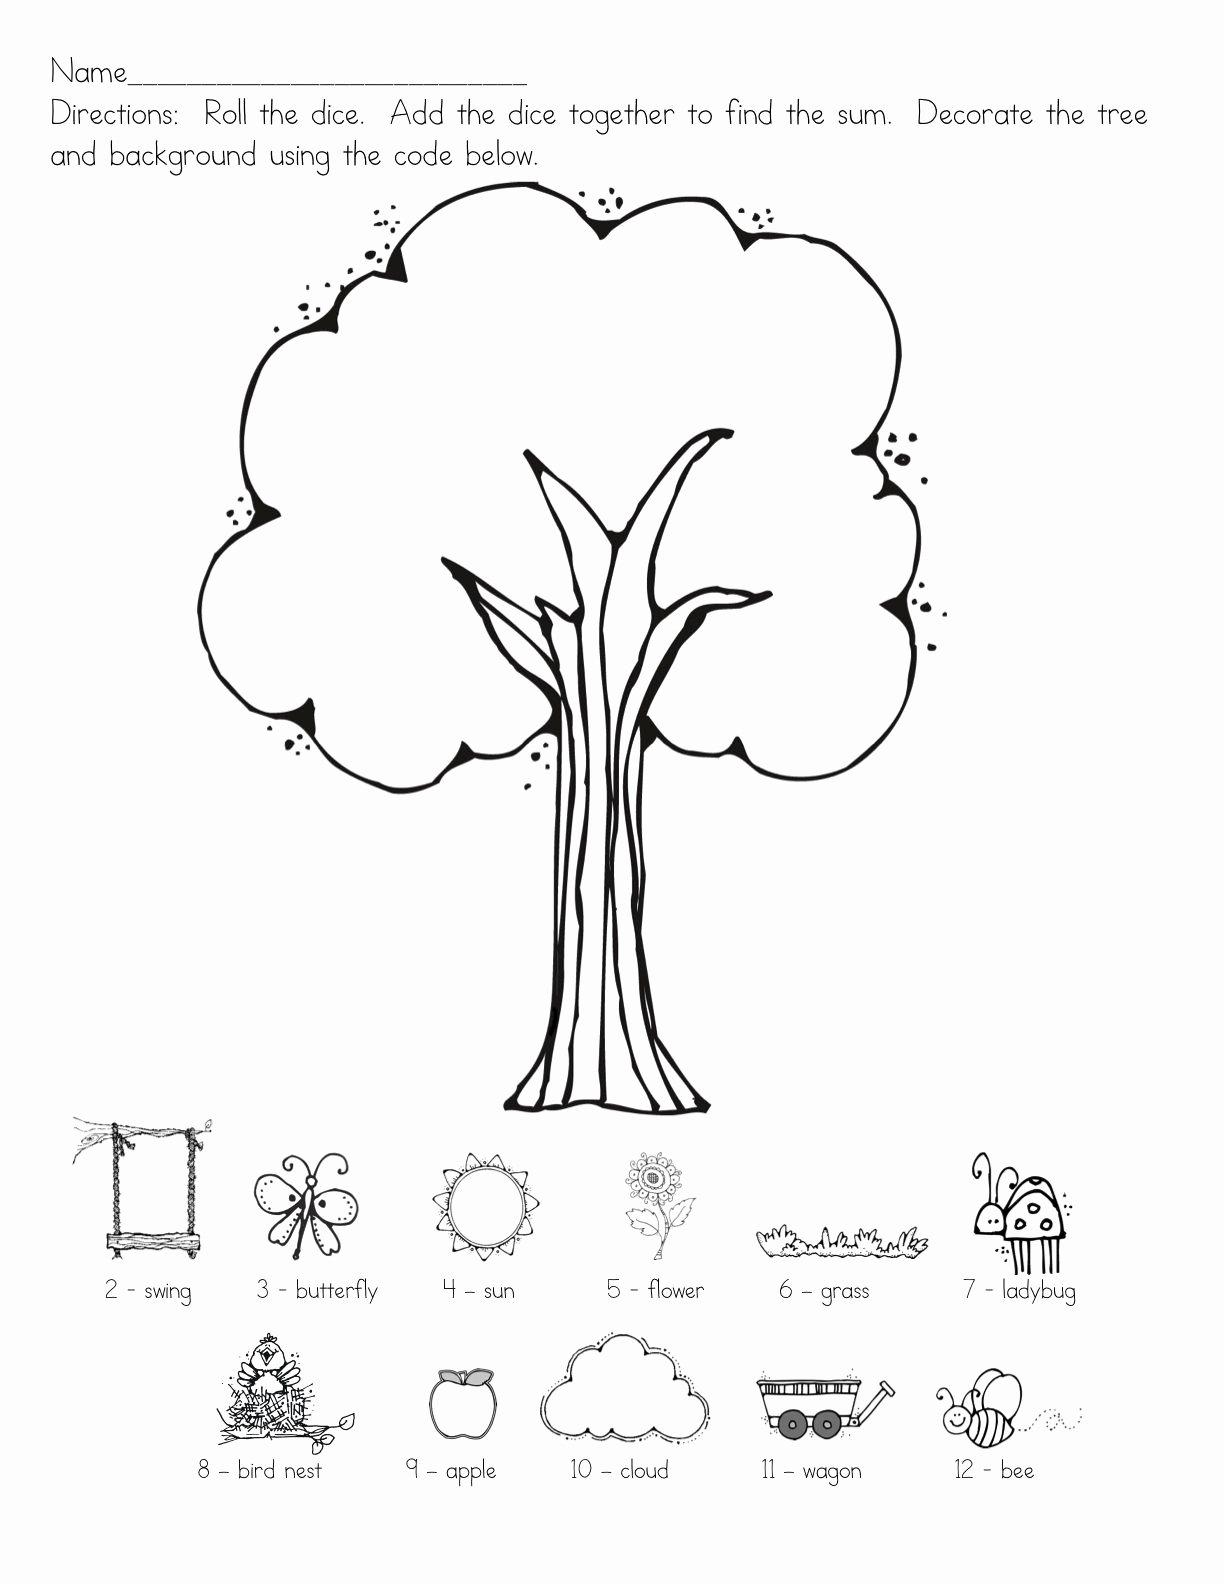 Spatial Concepts Worksheets For Preschoolers